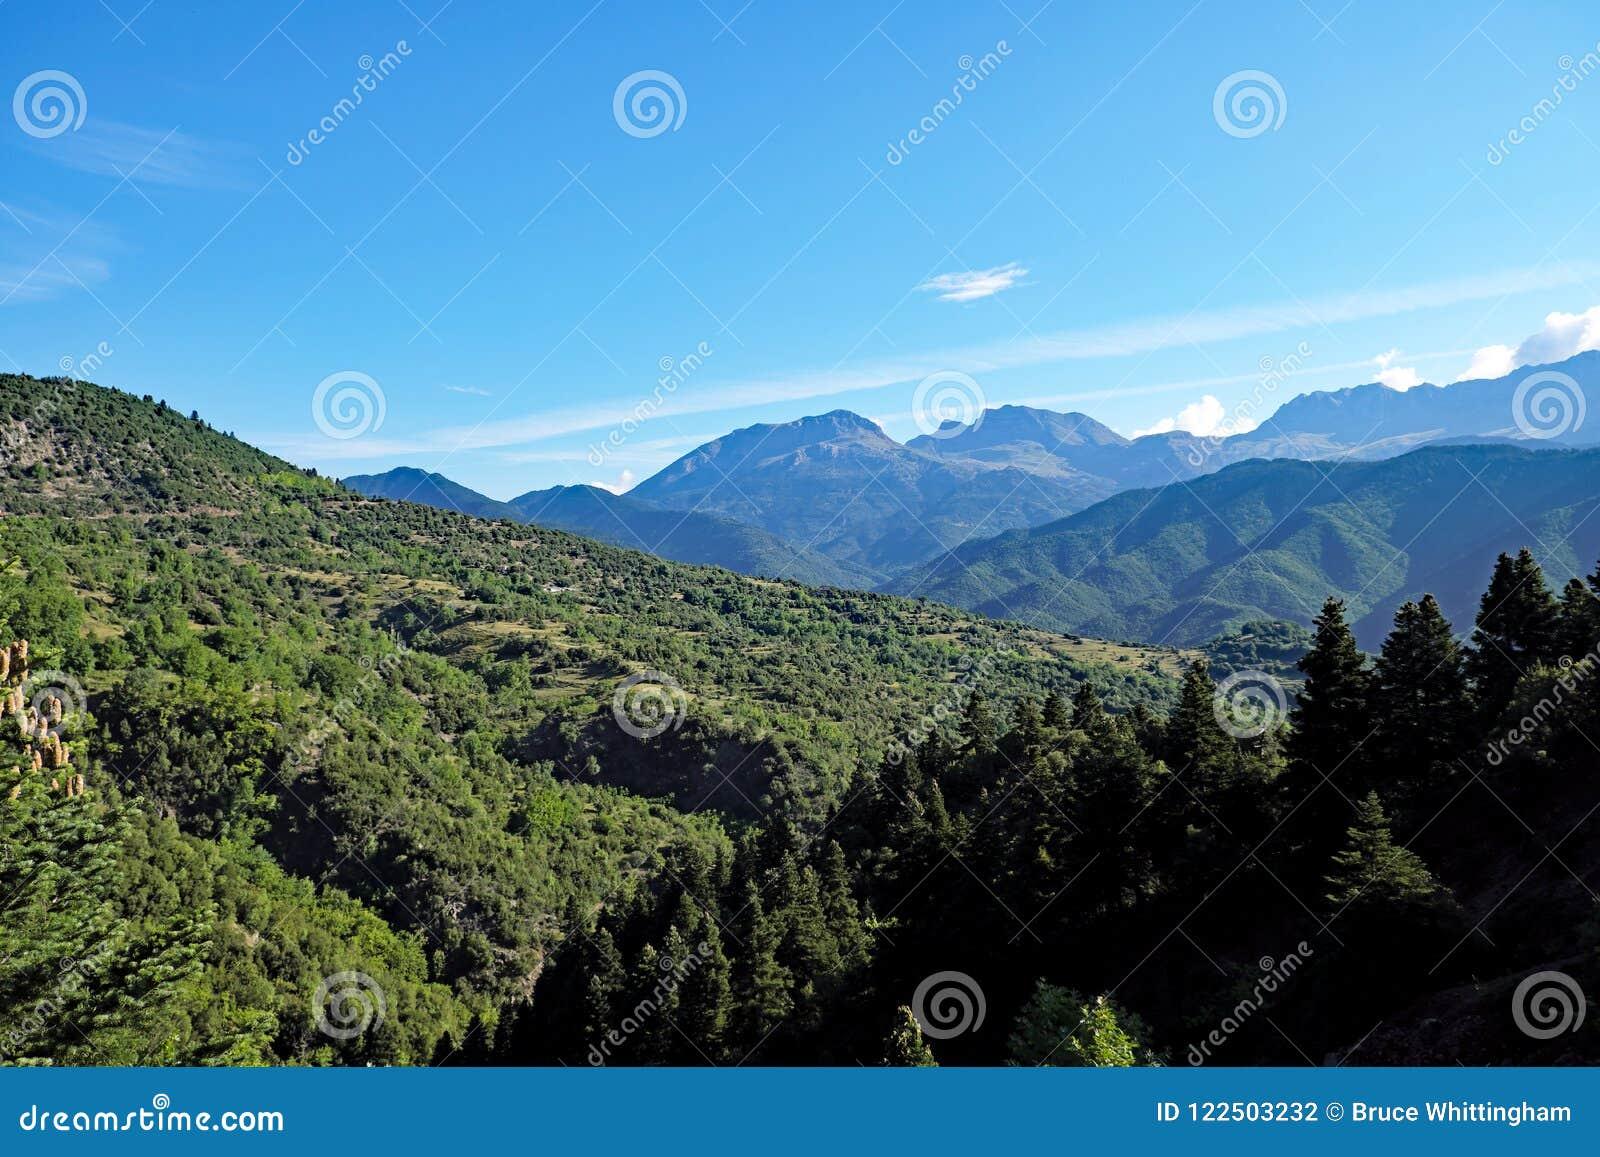 Grekiska bergpinjeskogar, Grekland